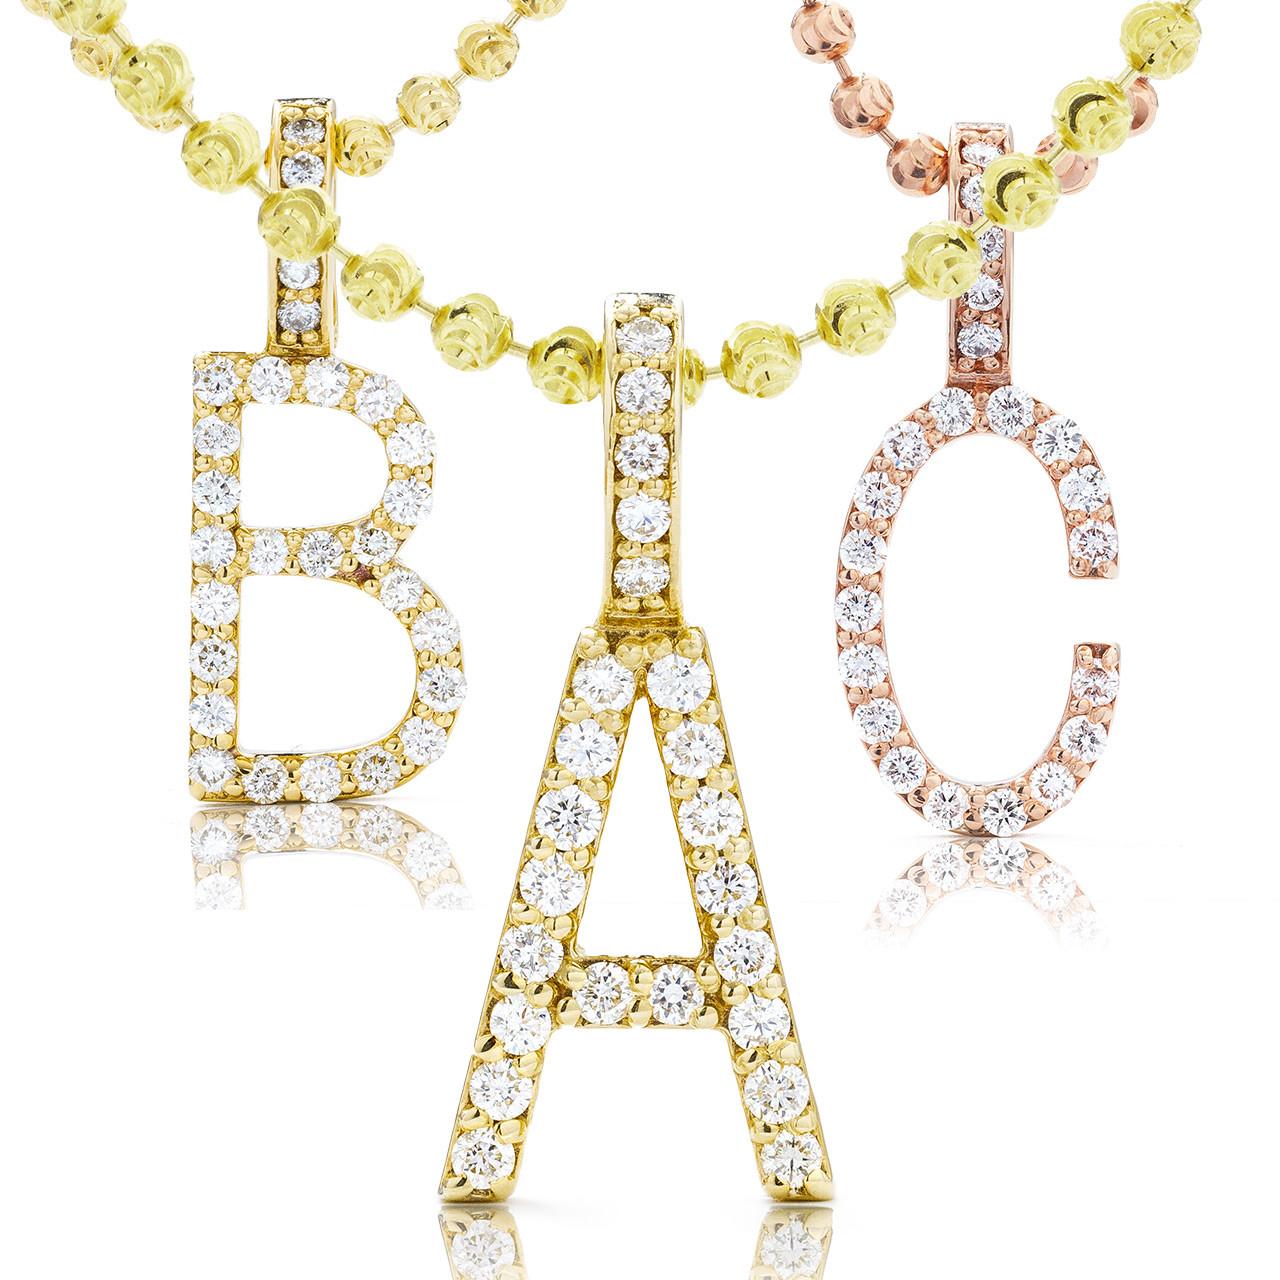 1476345d87886 10k Gold Diamond Initial Letter Pendant 0.30ct